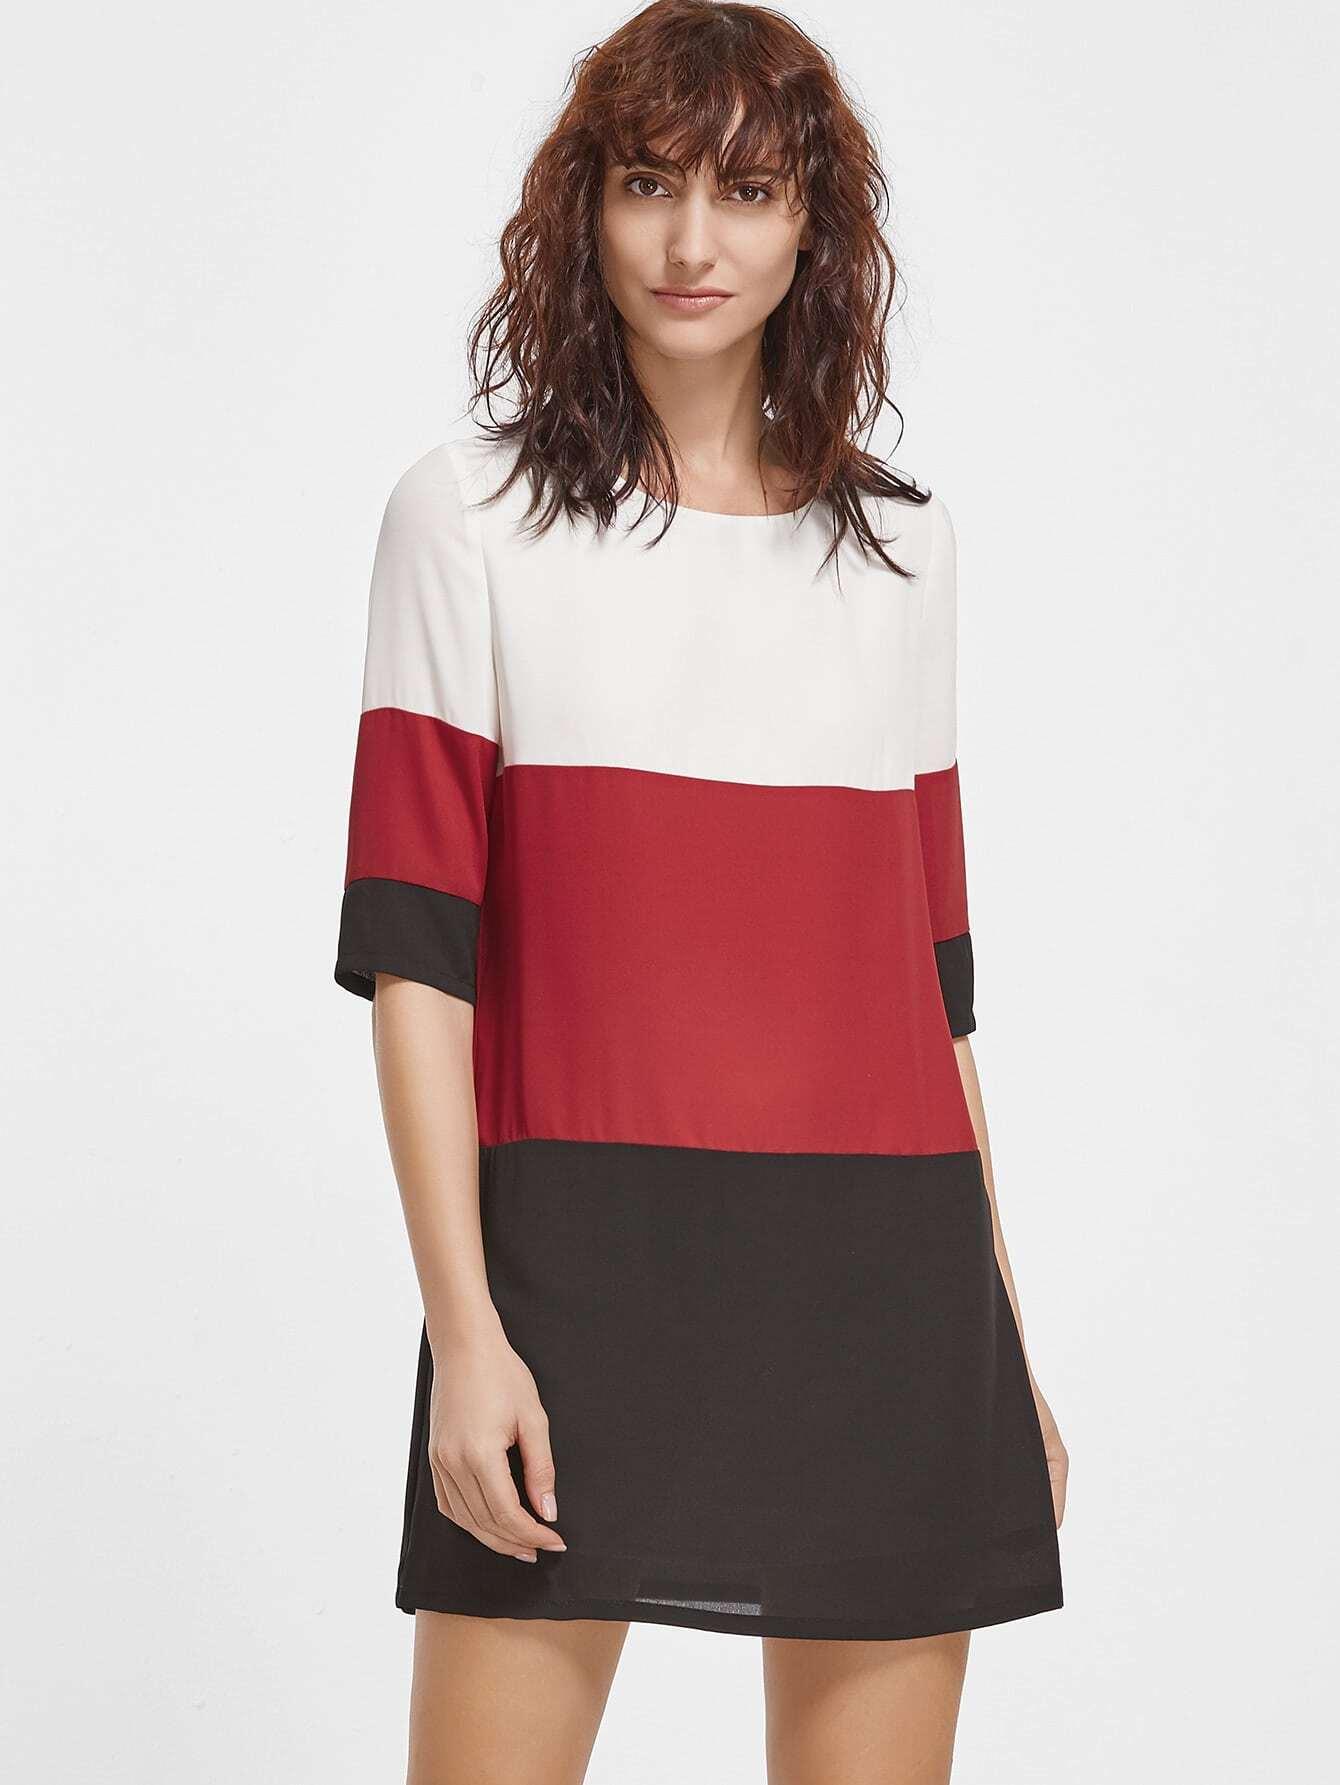 Color Block Half Sleeve Tunic Dress dress161202704